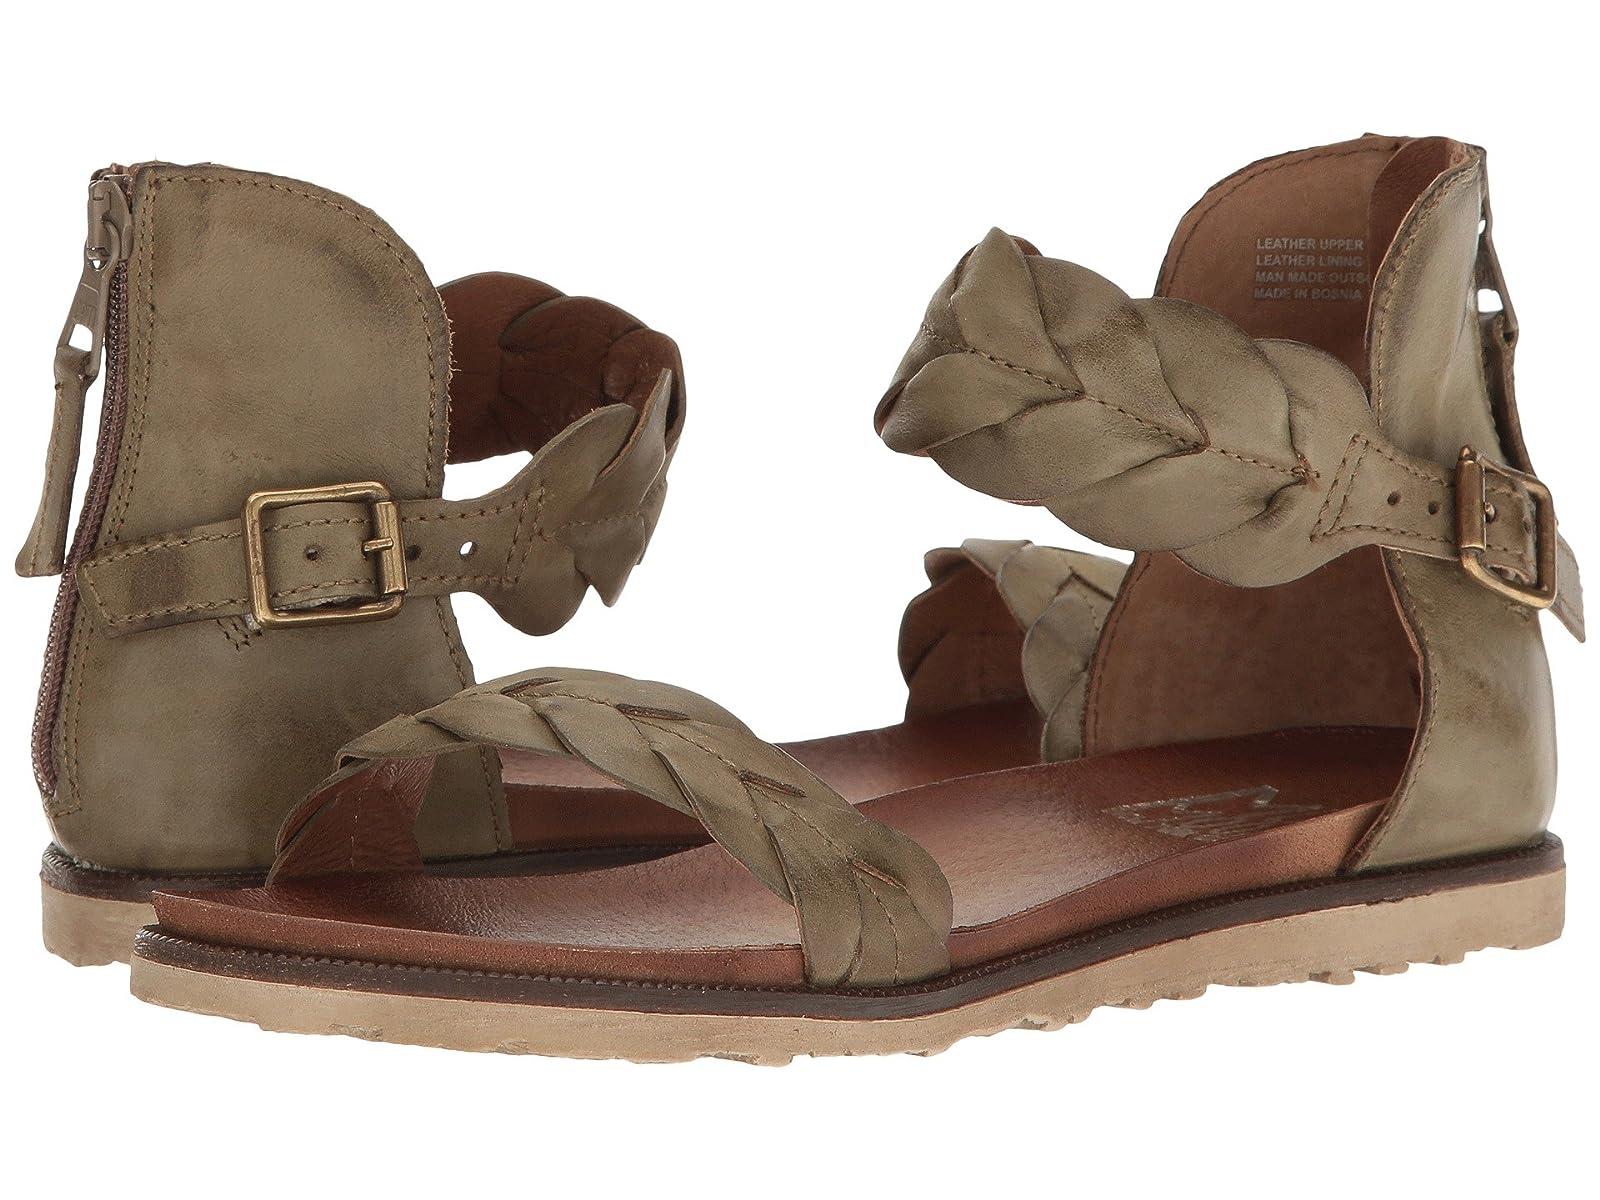 Miz Mooz TaftCheap and distinctive eye-catching shoes